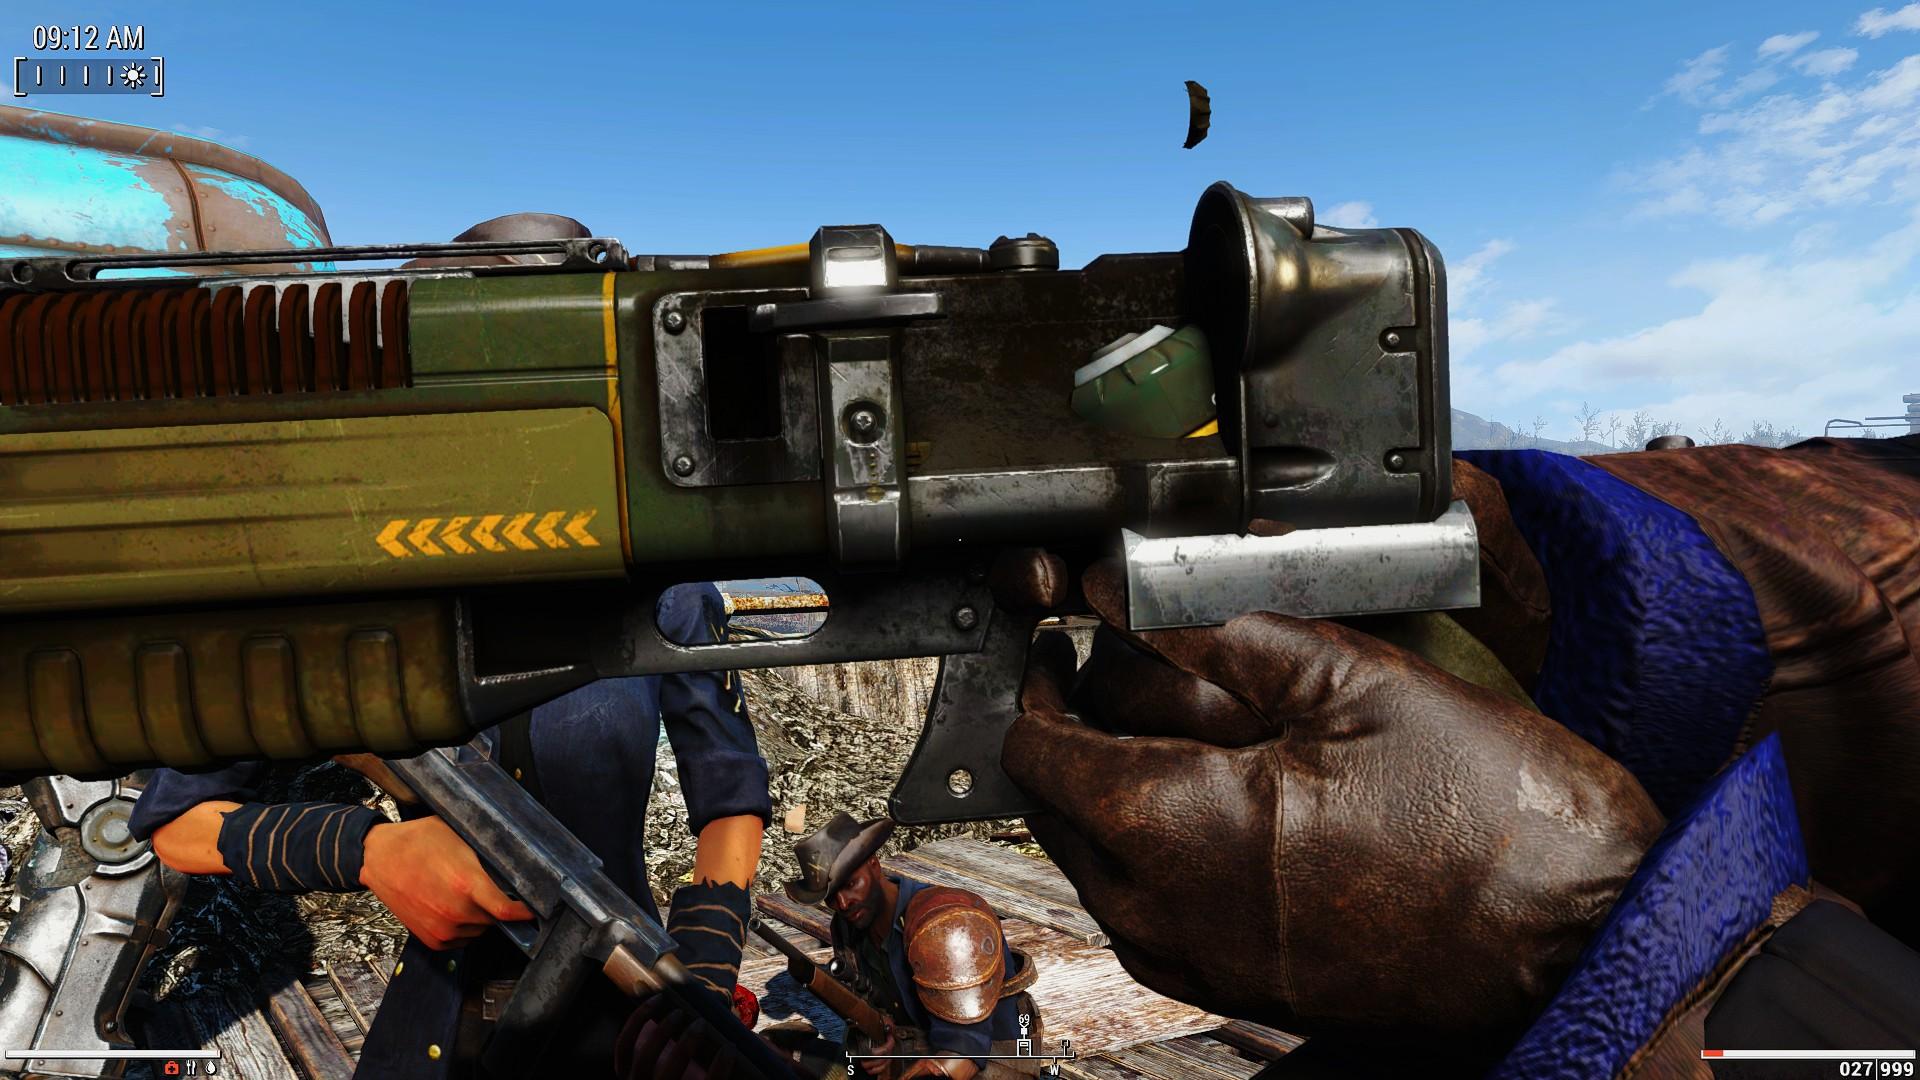 FO4  Laser Pistol mesh Glitch 94725E855A85D252BECD47F4B5C6CCCB124E8721